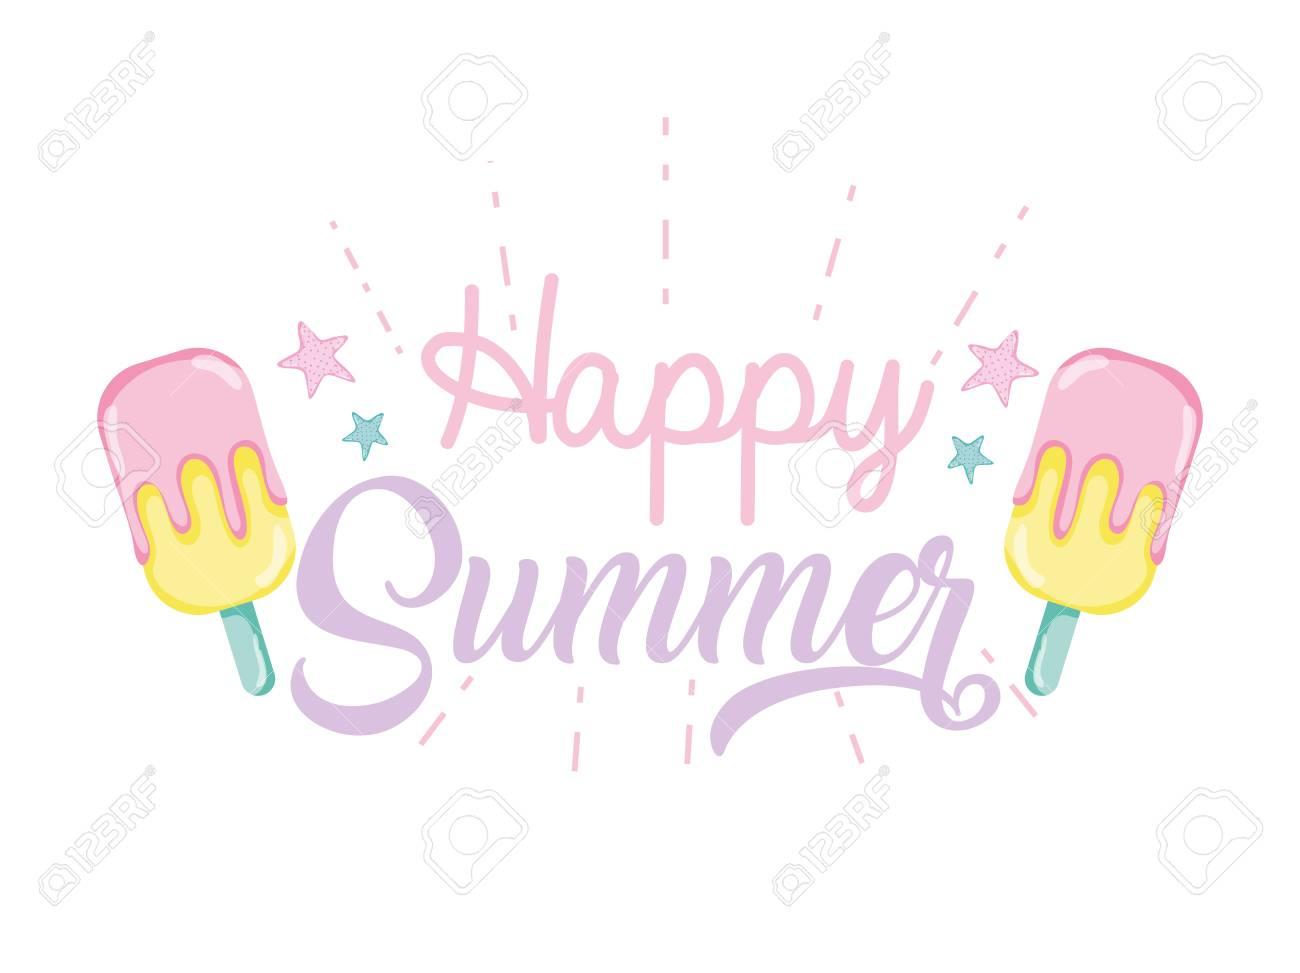 Happy summer banner illustration graphic design.